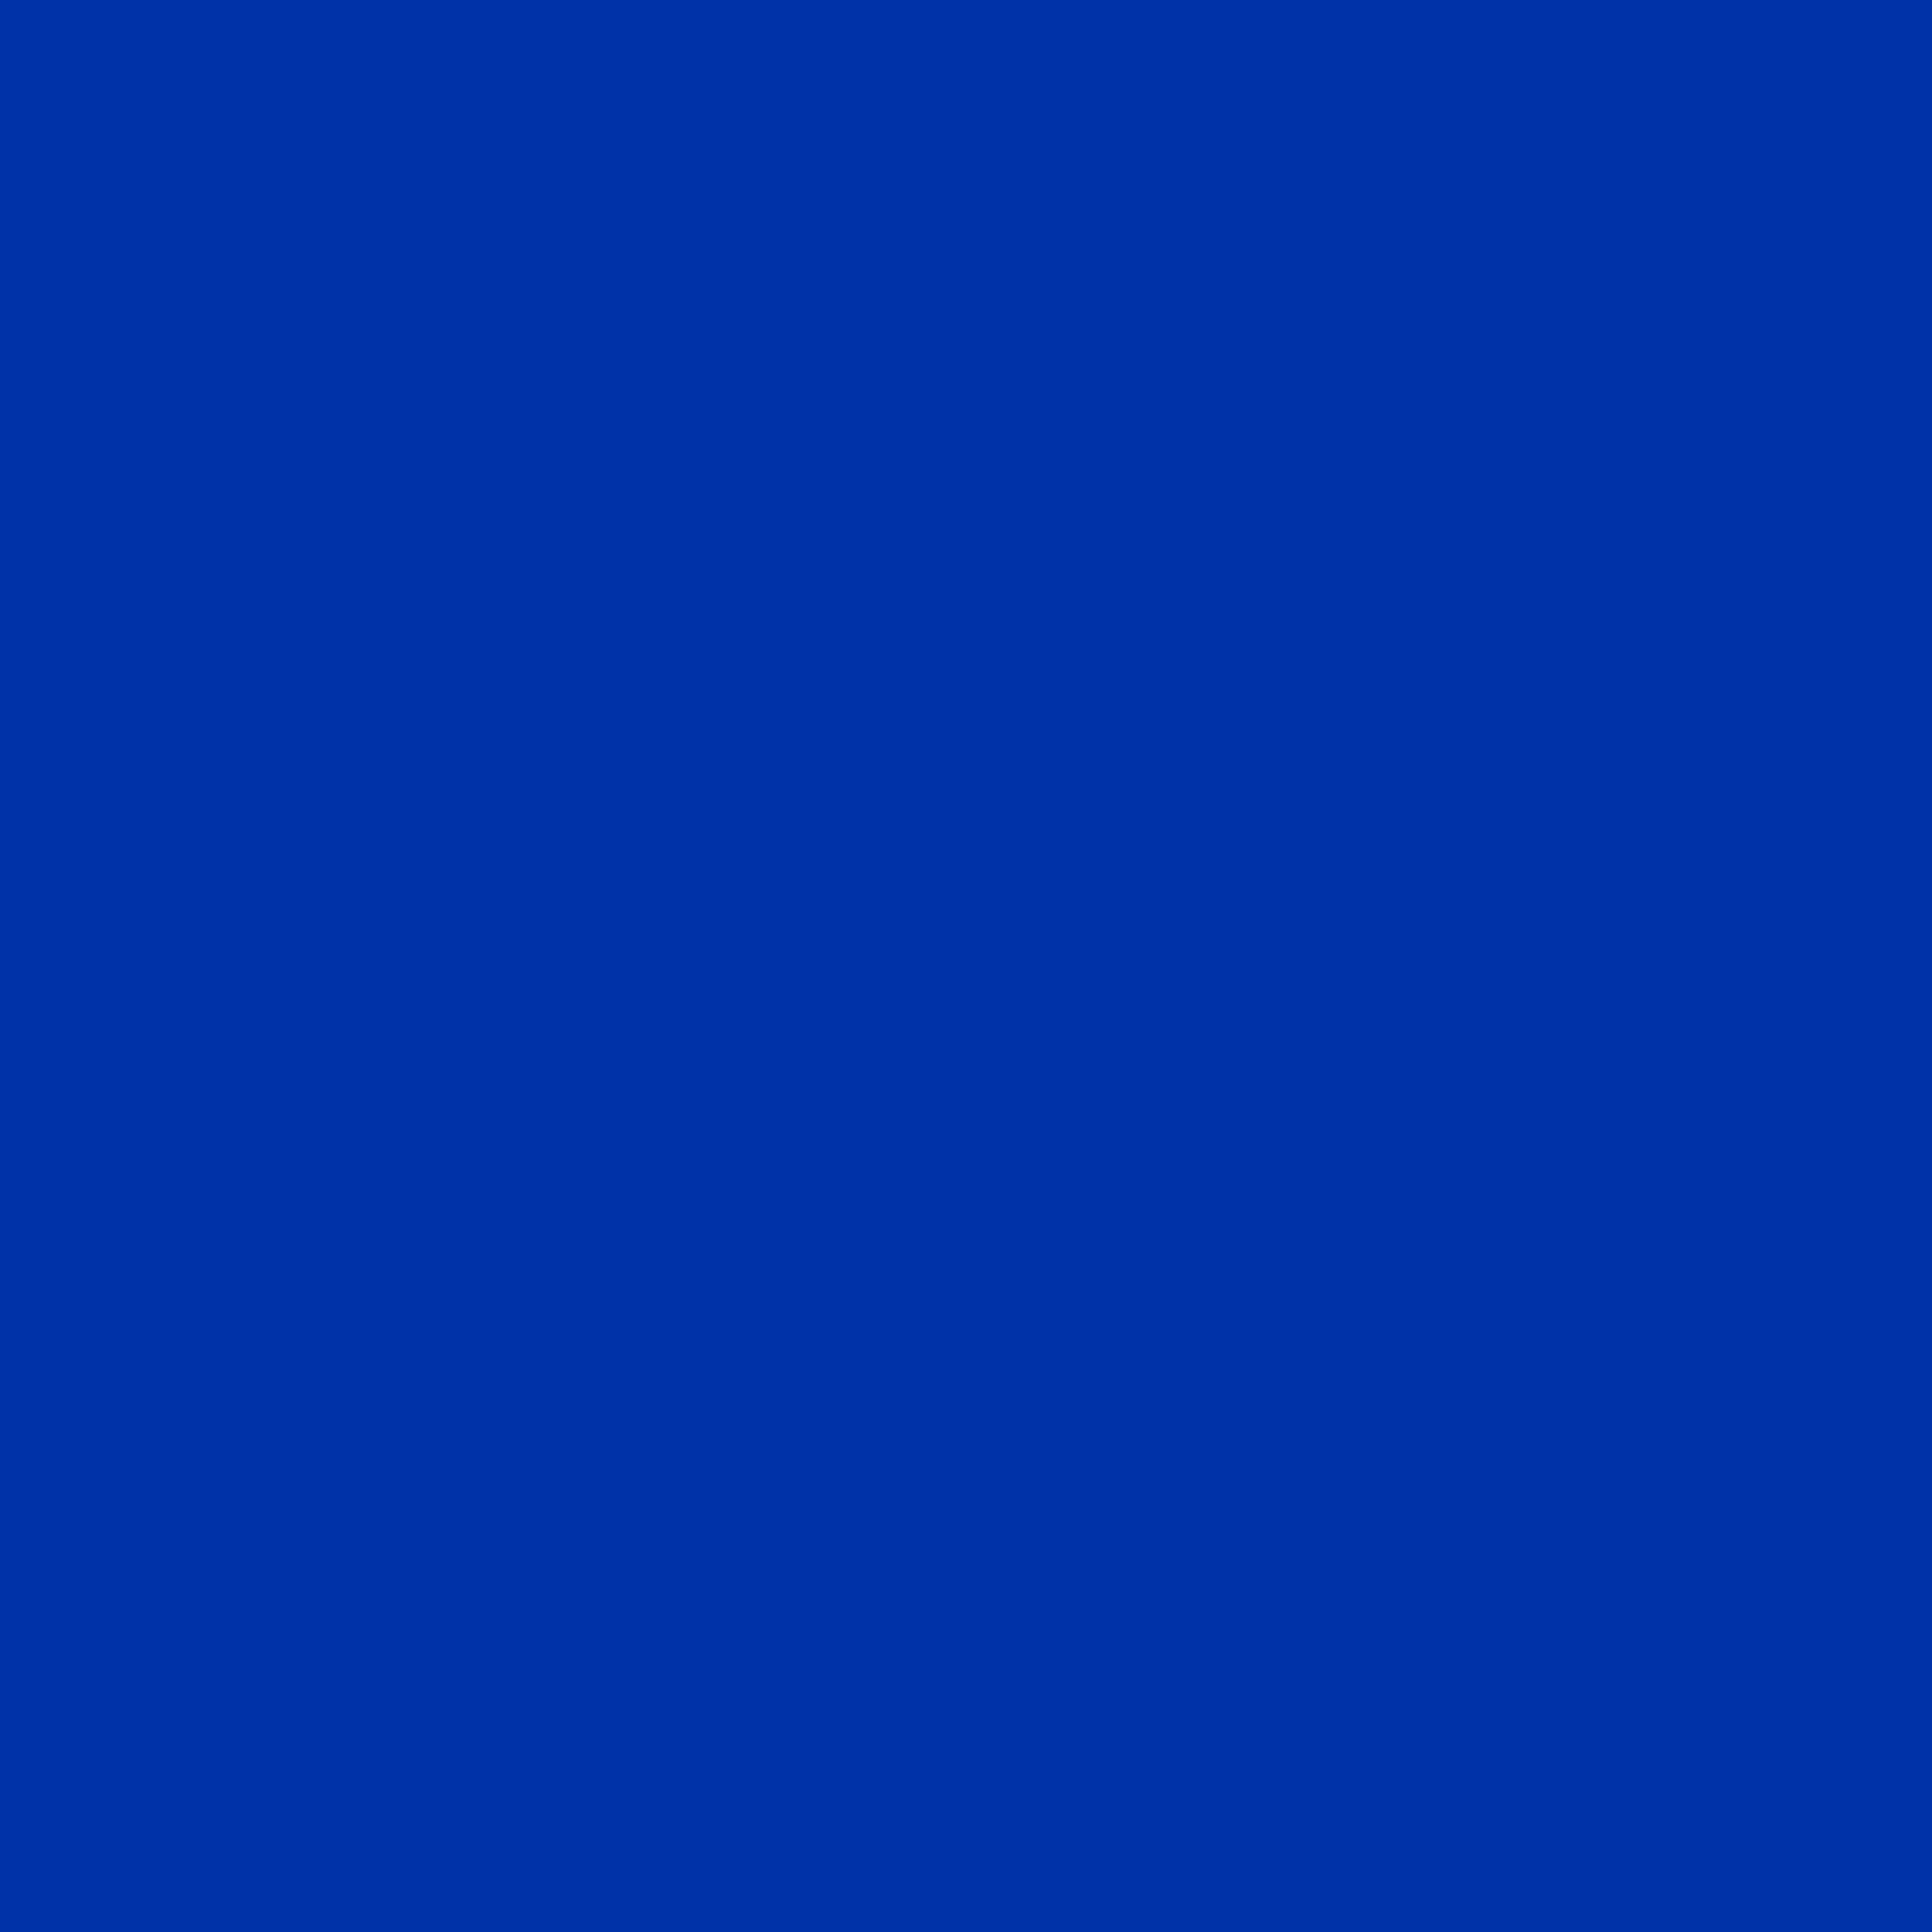 3600x3600 UA Blue Solid Color Background